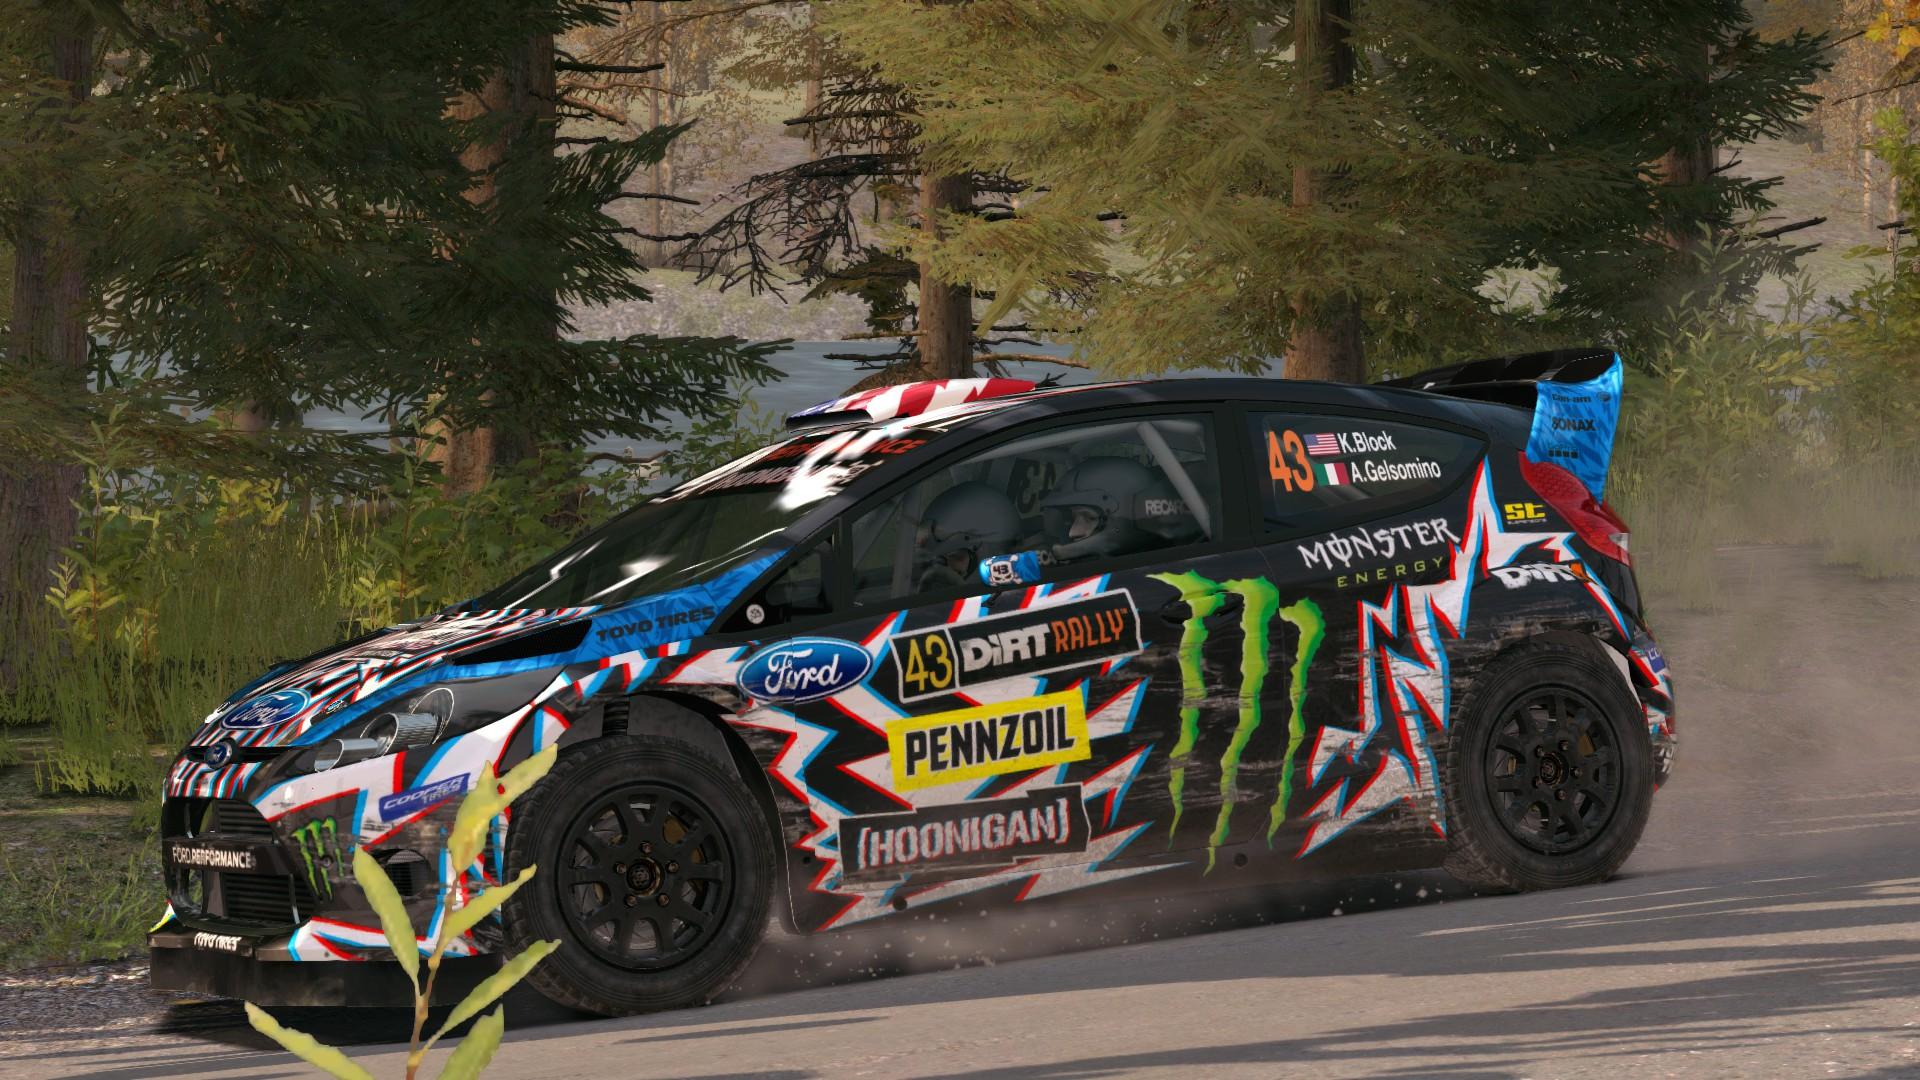 Ford Fiesta Rs Rally 2017 Hoonigan Racing Death Spray